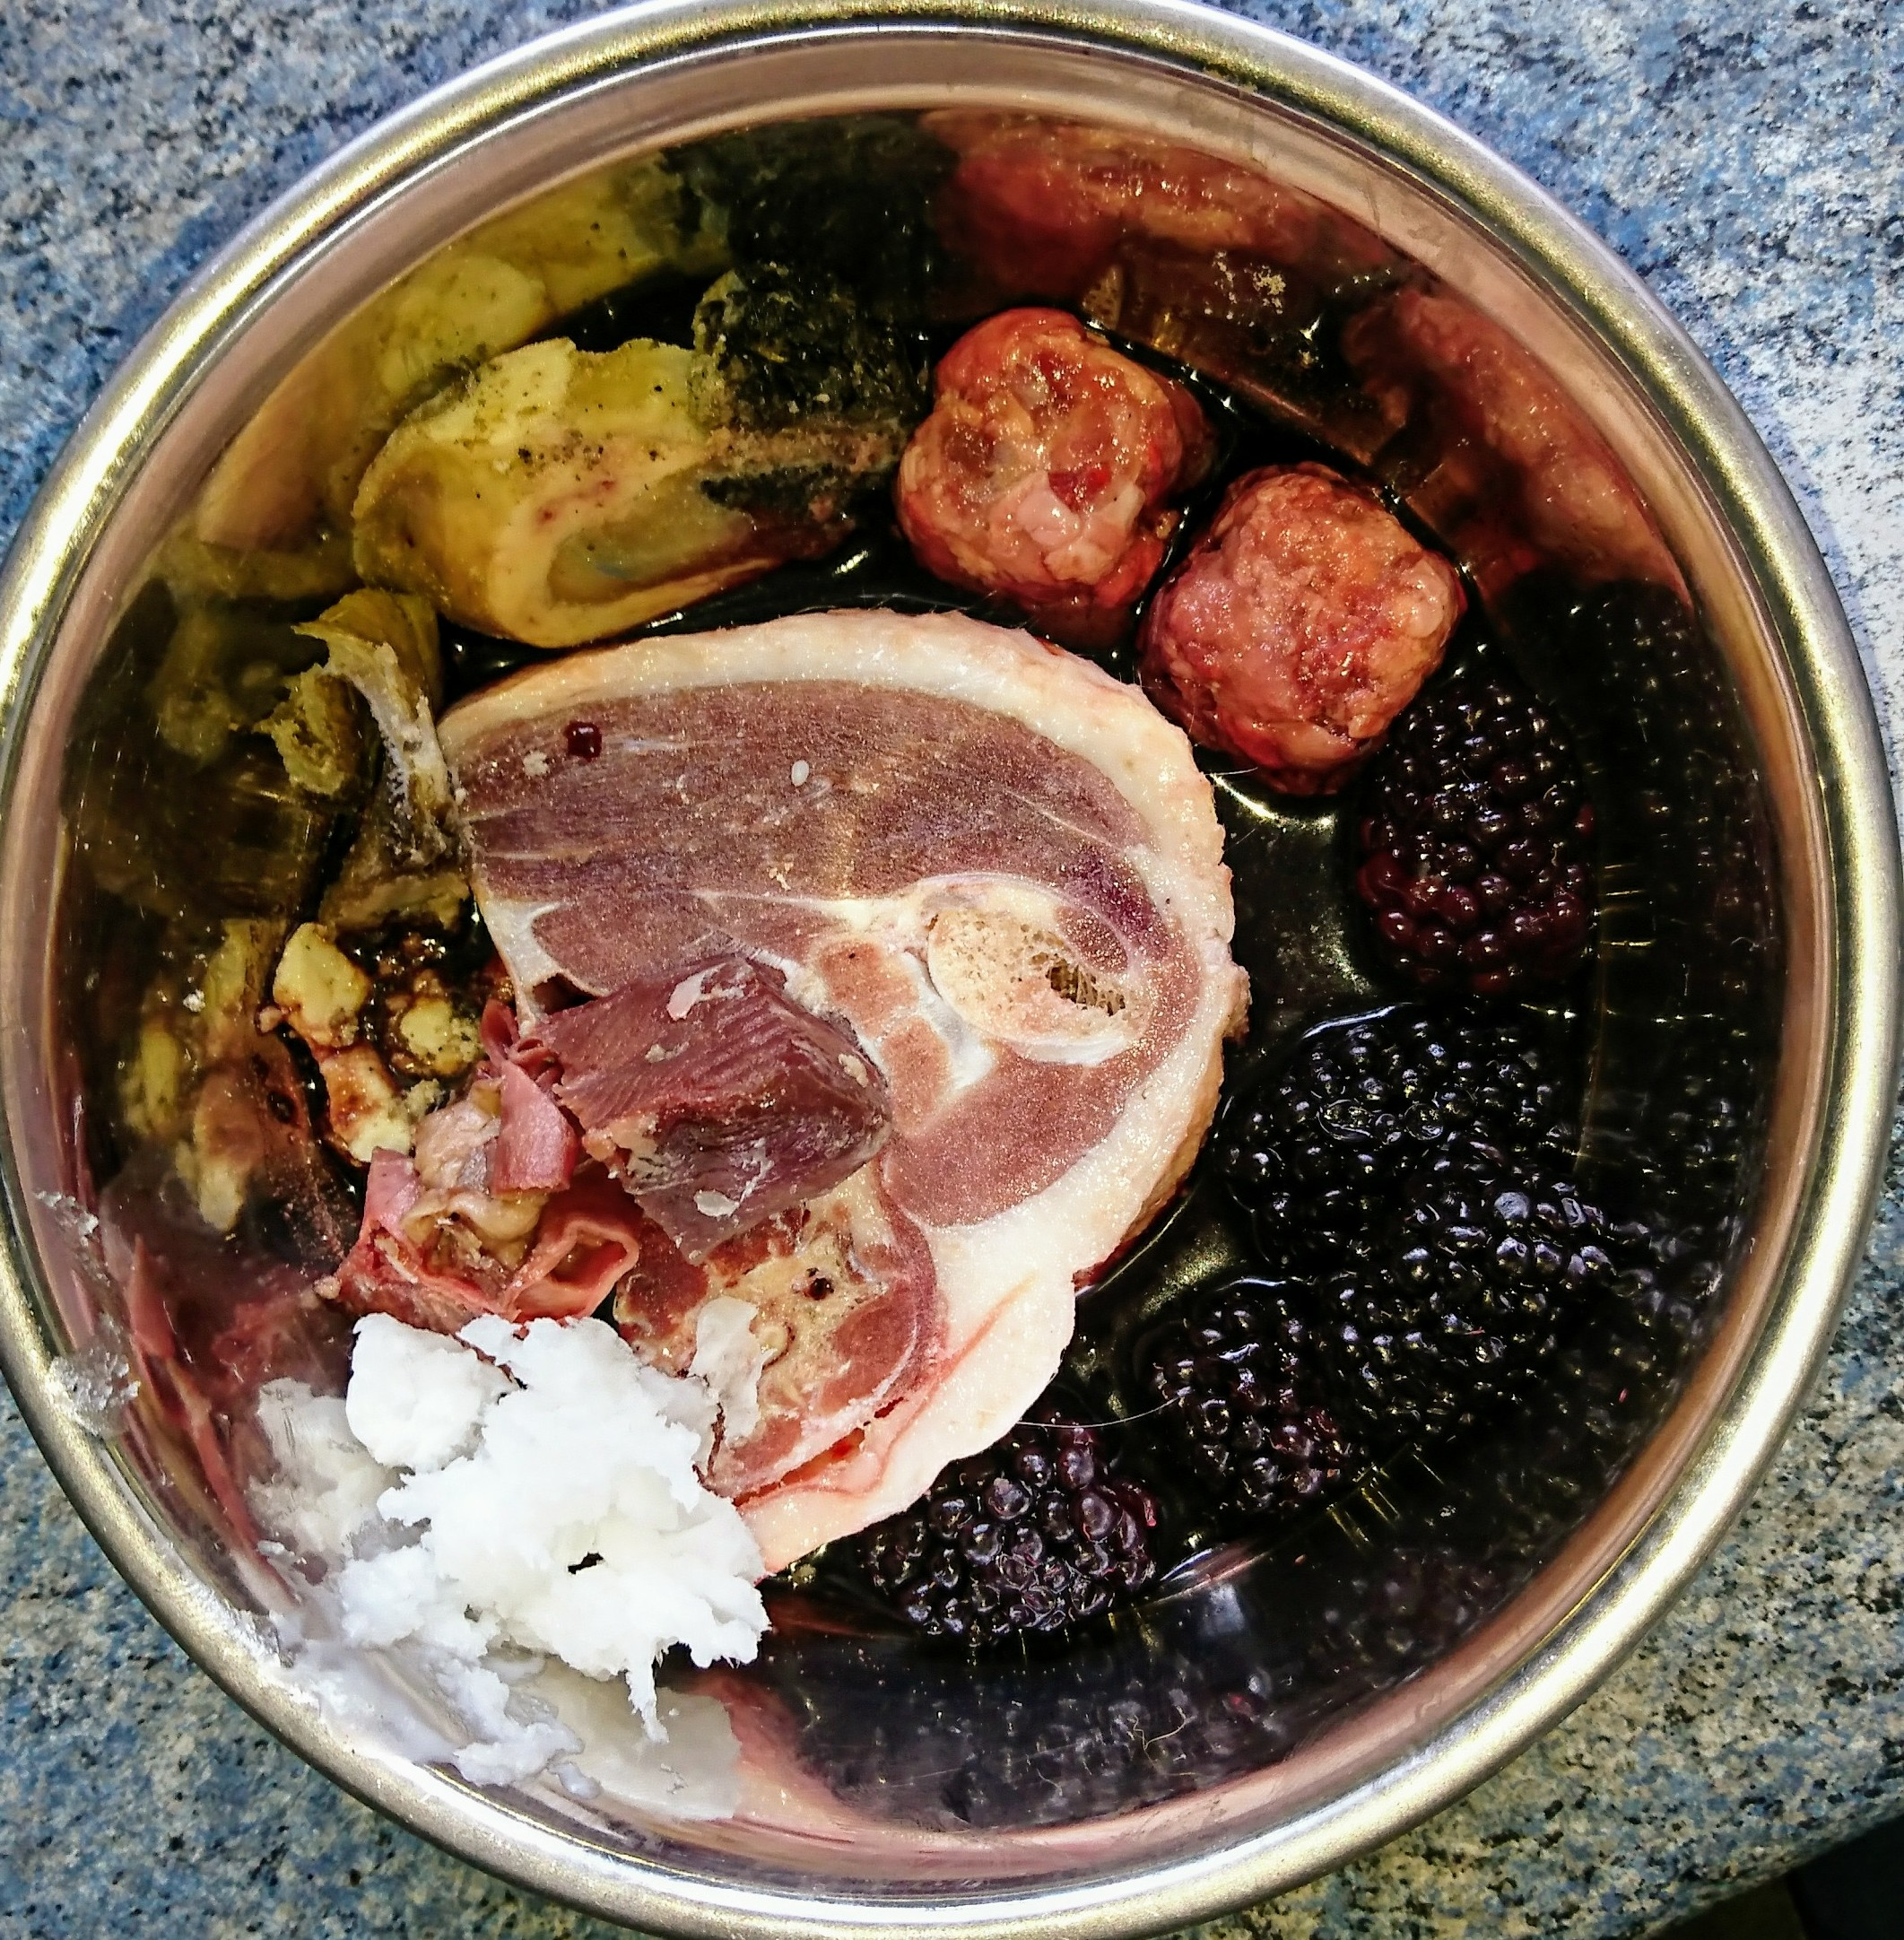 offal-cube-black-berries-duck-chunks-coconut-oil-tripe-chunks.